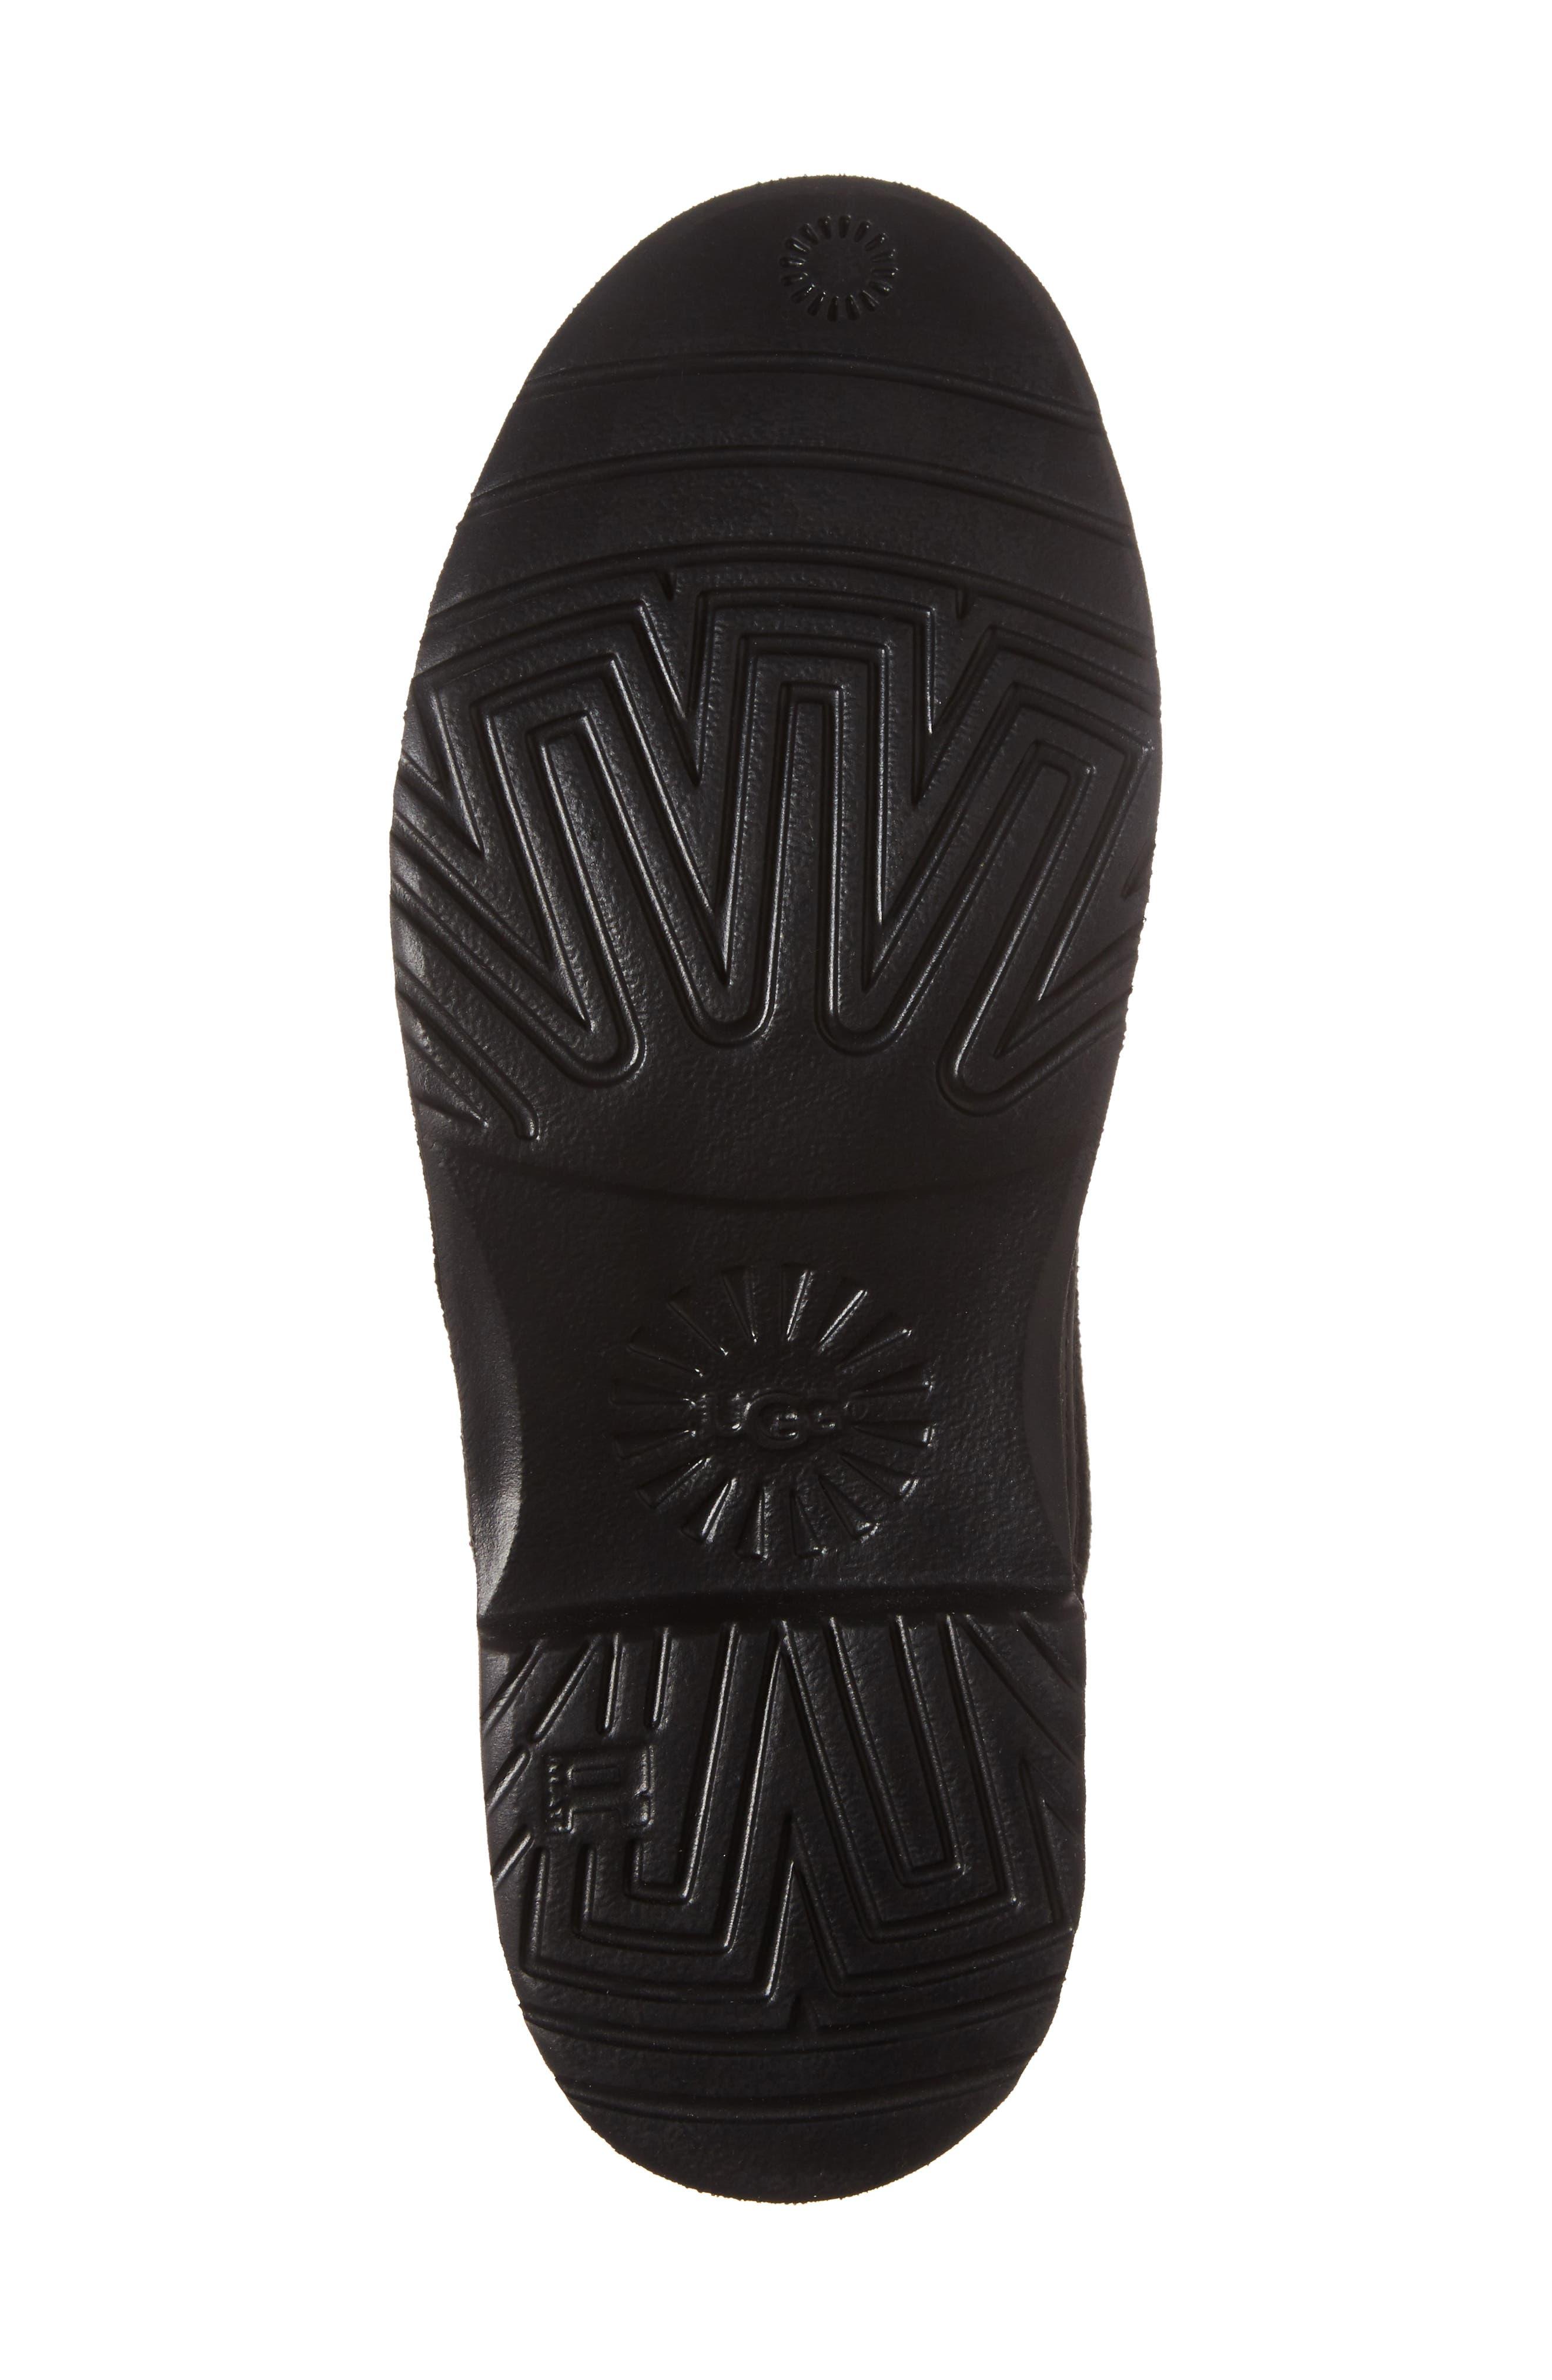 Naiyah Lace-Back Genuine Shearling Boot,                             Alternate thumbnail 6, color,                             BLACK/ BLACK NUBUCK LEATHER